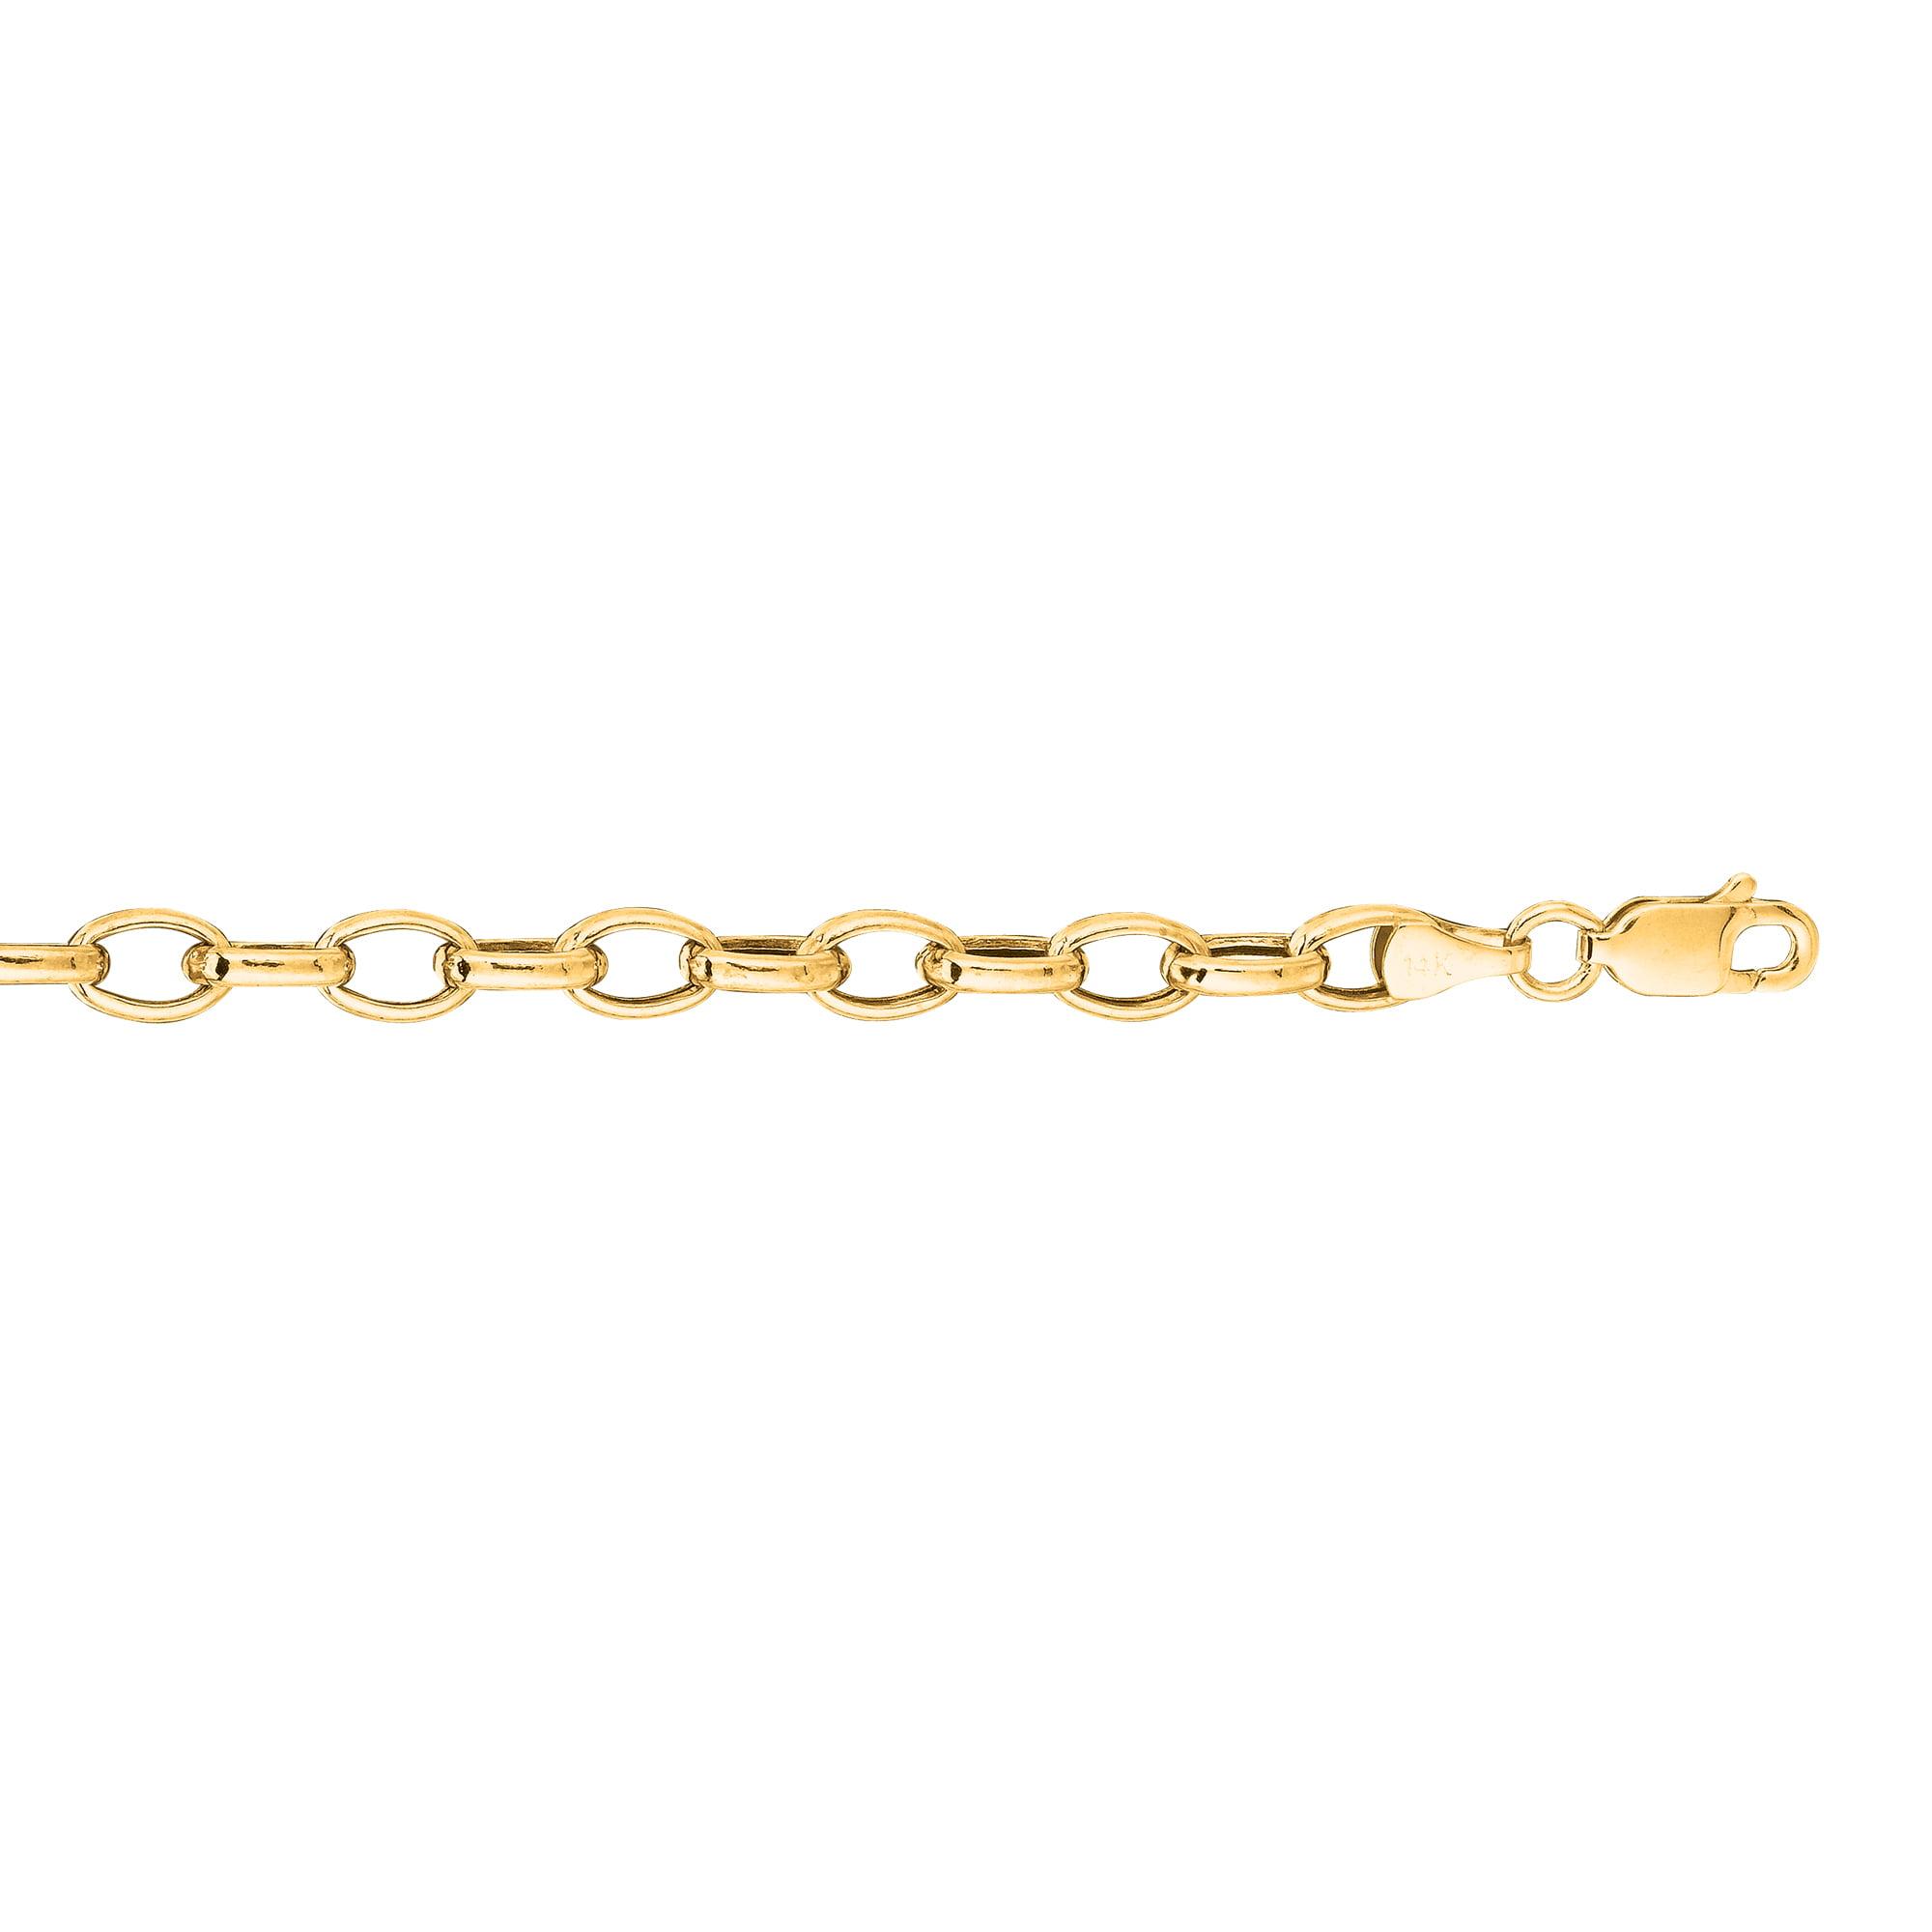 BH 5 Star Jewelry 14k Yellow Gold Diamond Cut Forsantina Chain